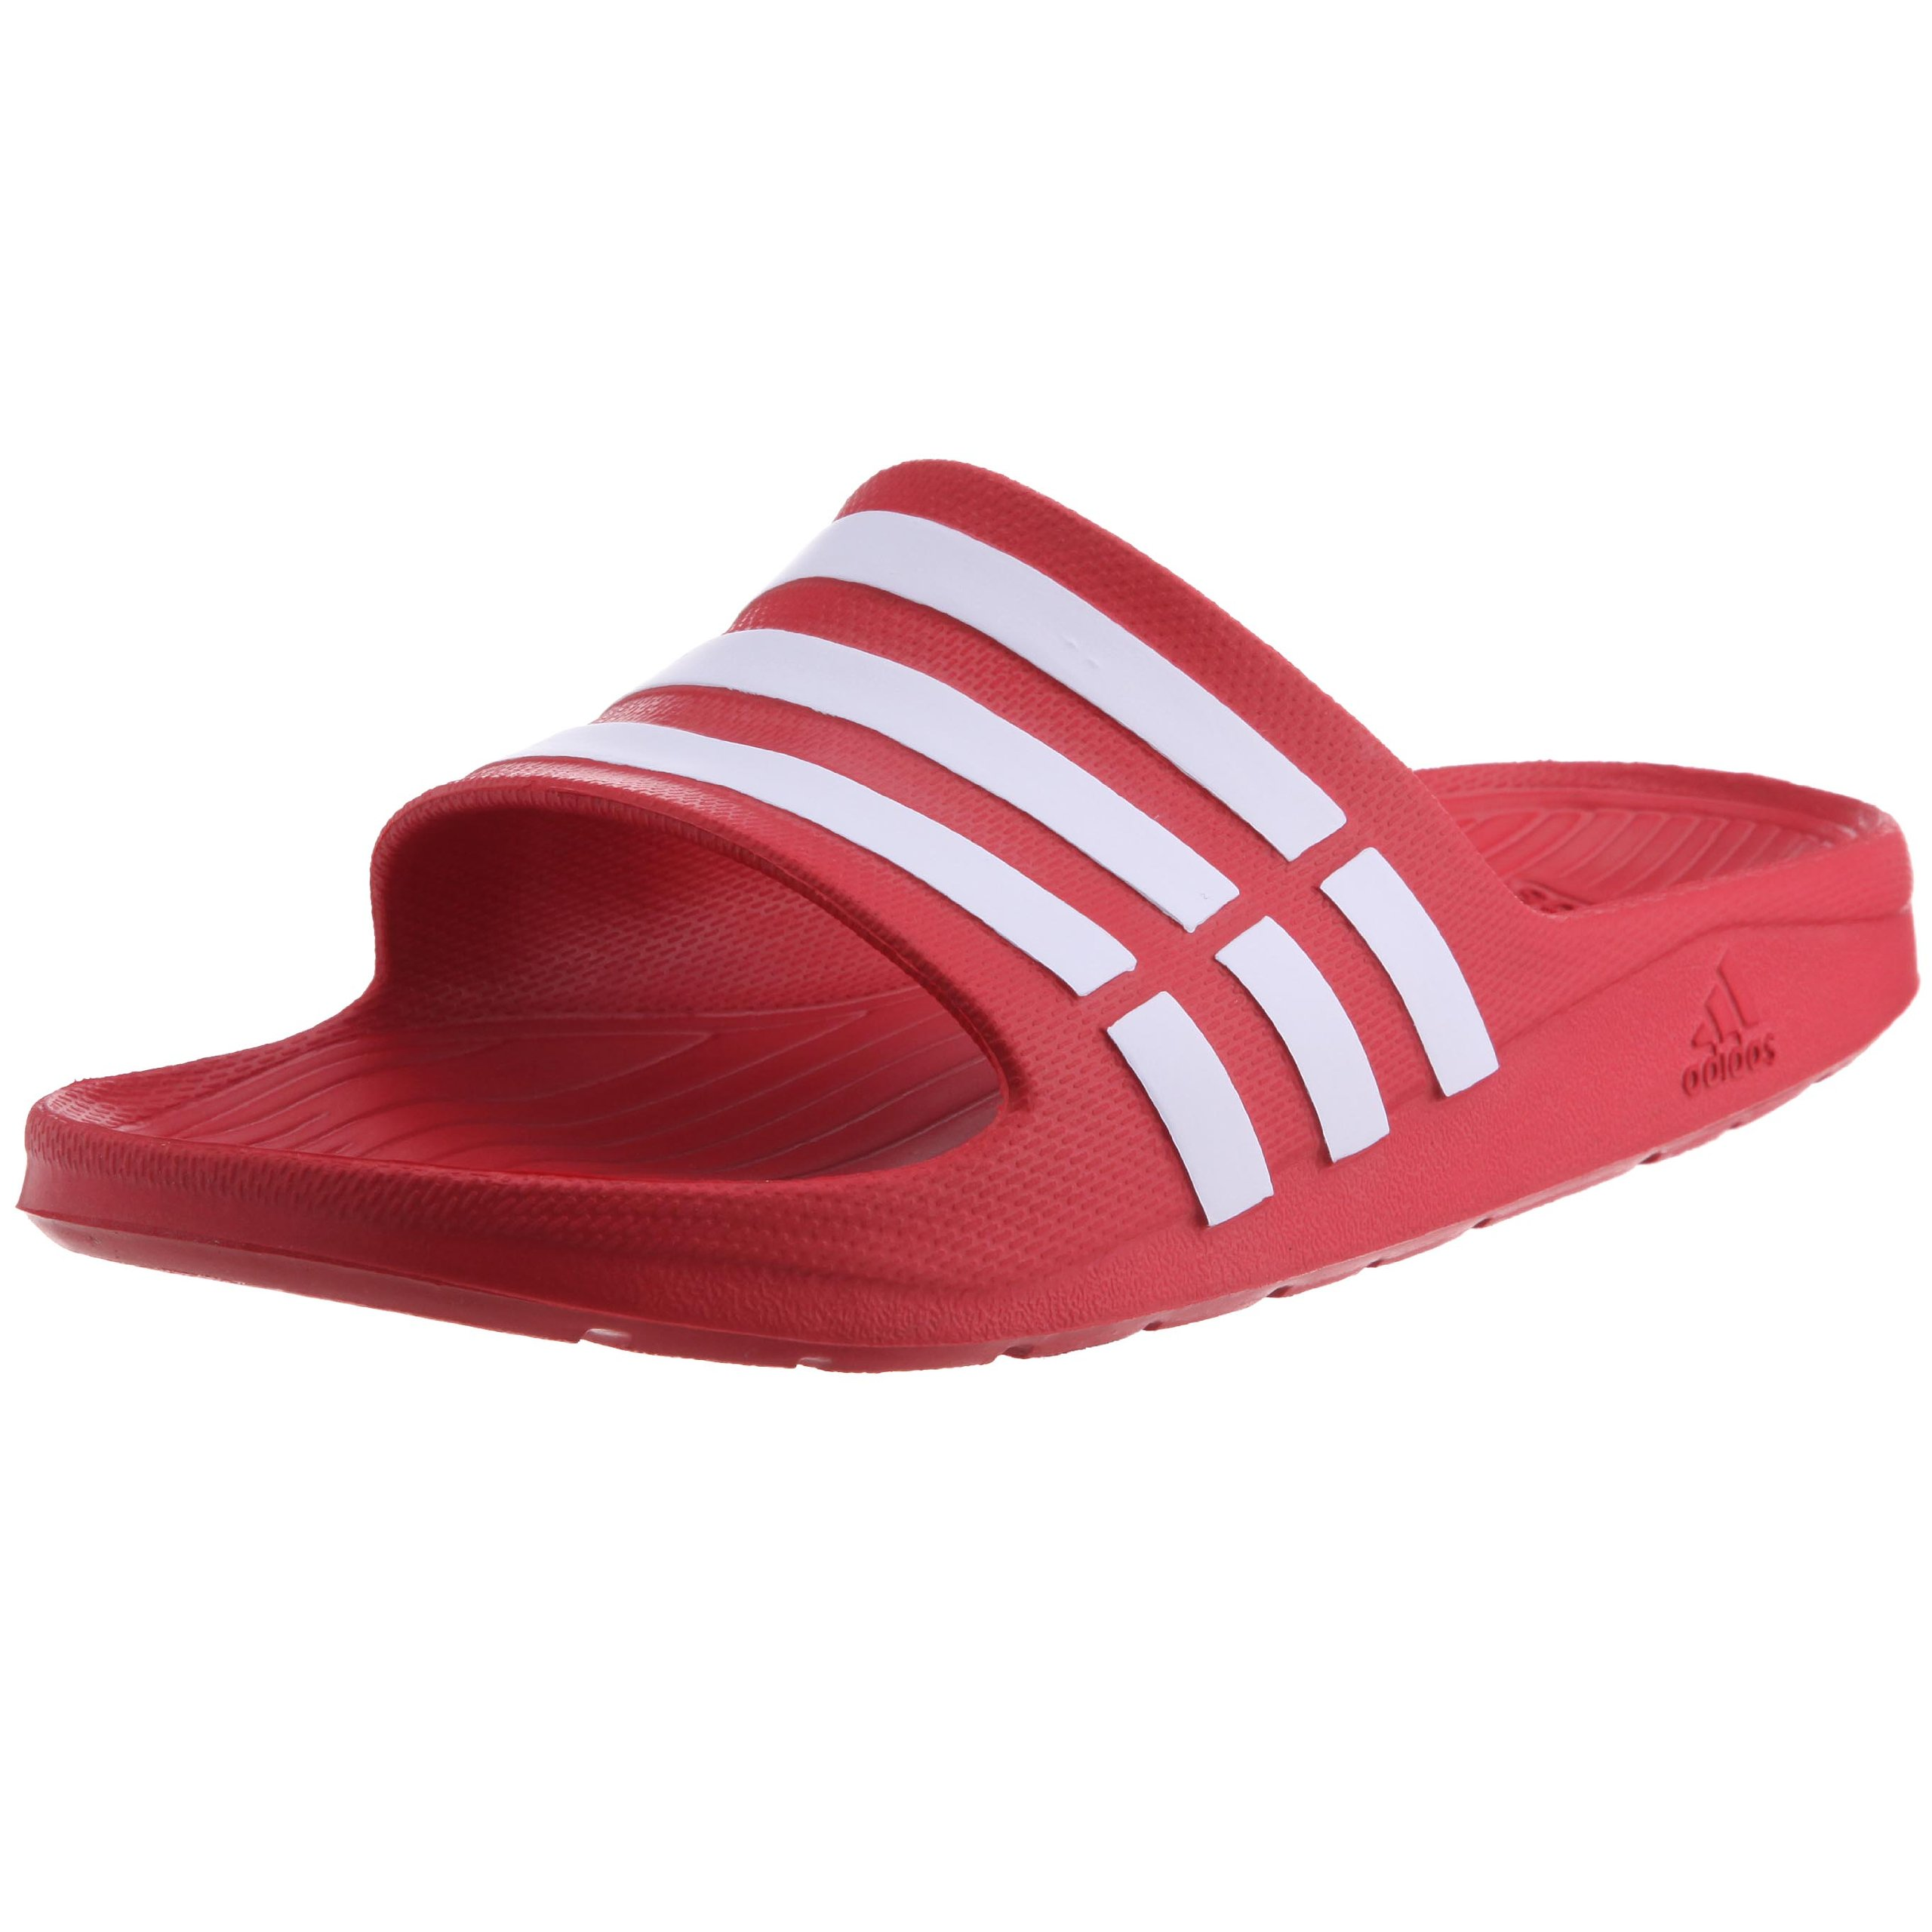 Adidas Adulto SlideChanclas Ofertaswow Duramo Unisex PukZXi